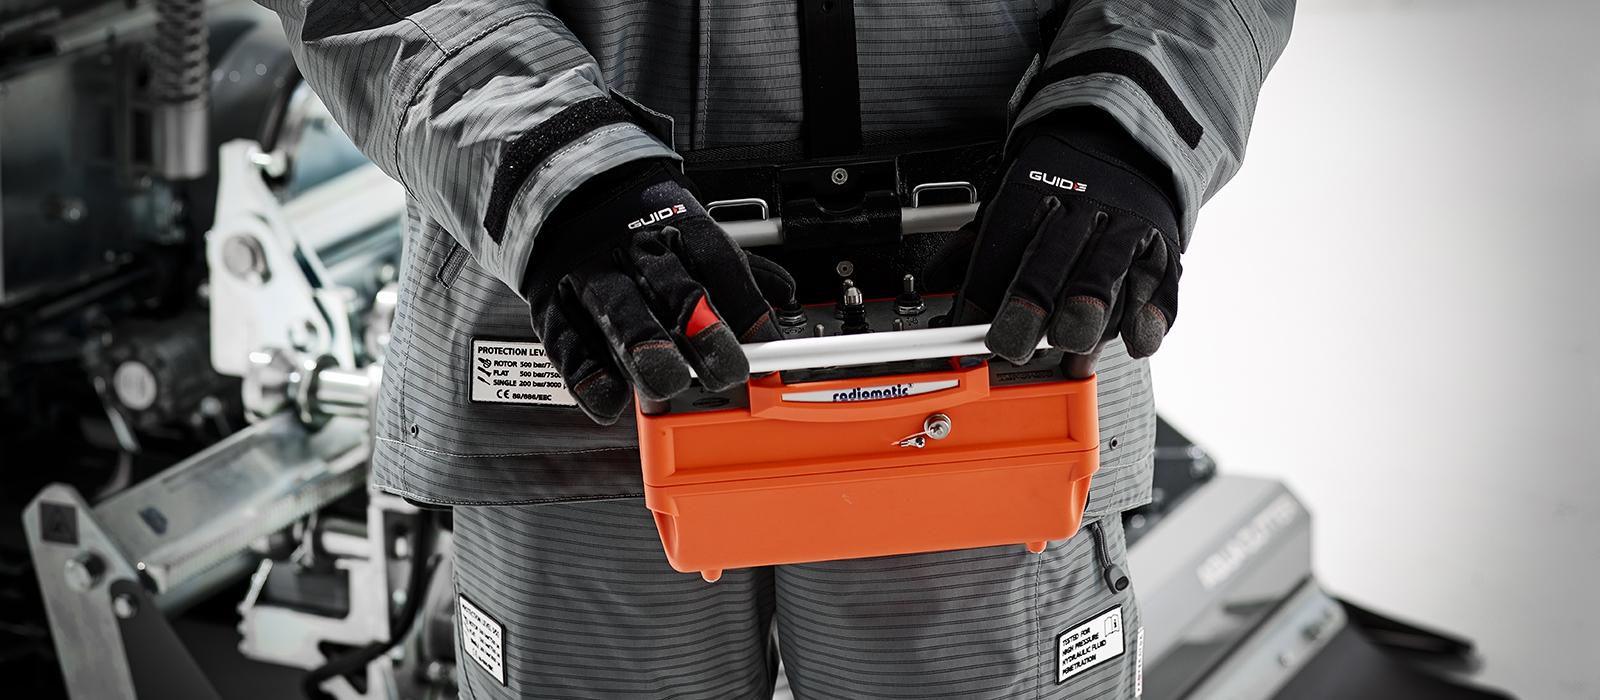 hydrodemolition aquajet systems aqua cutter power pack radio remote control